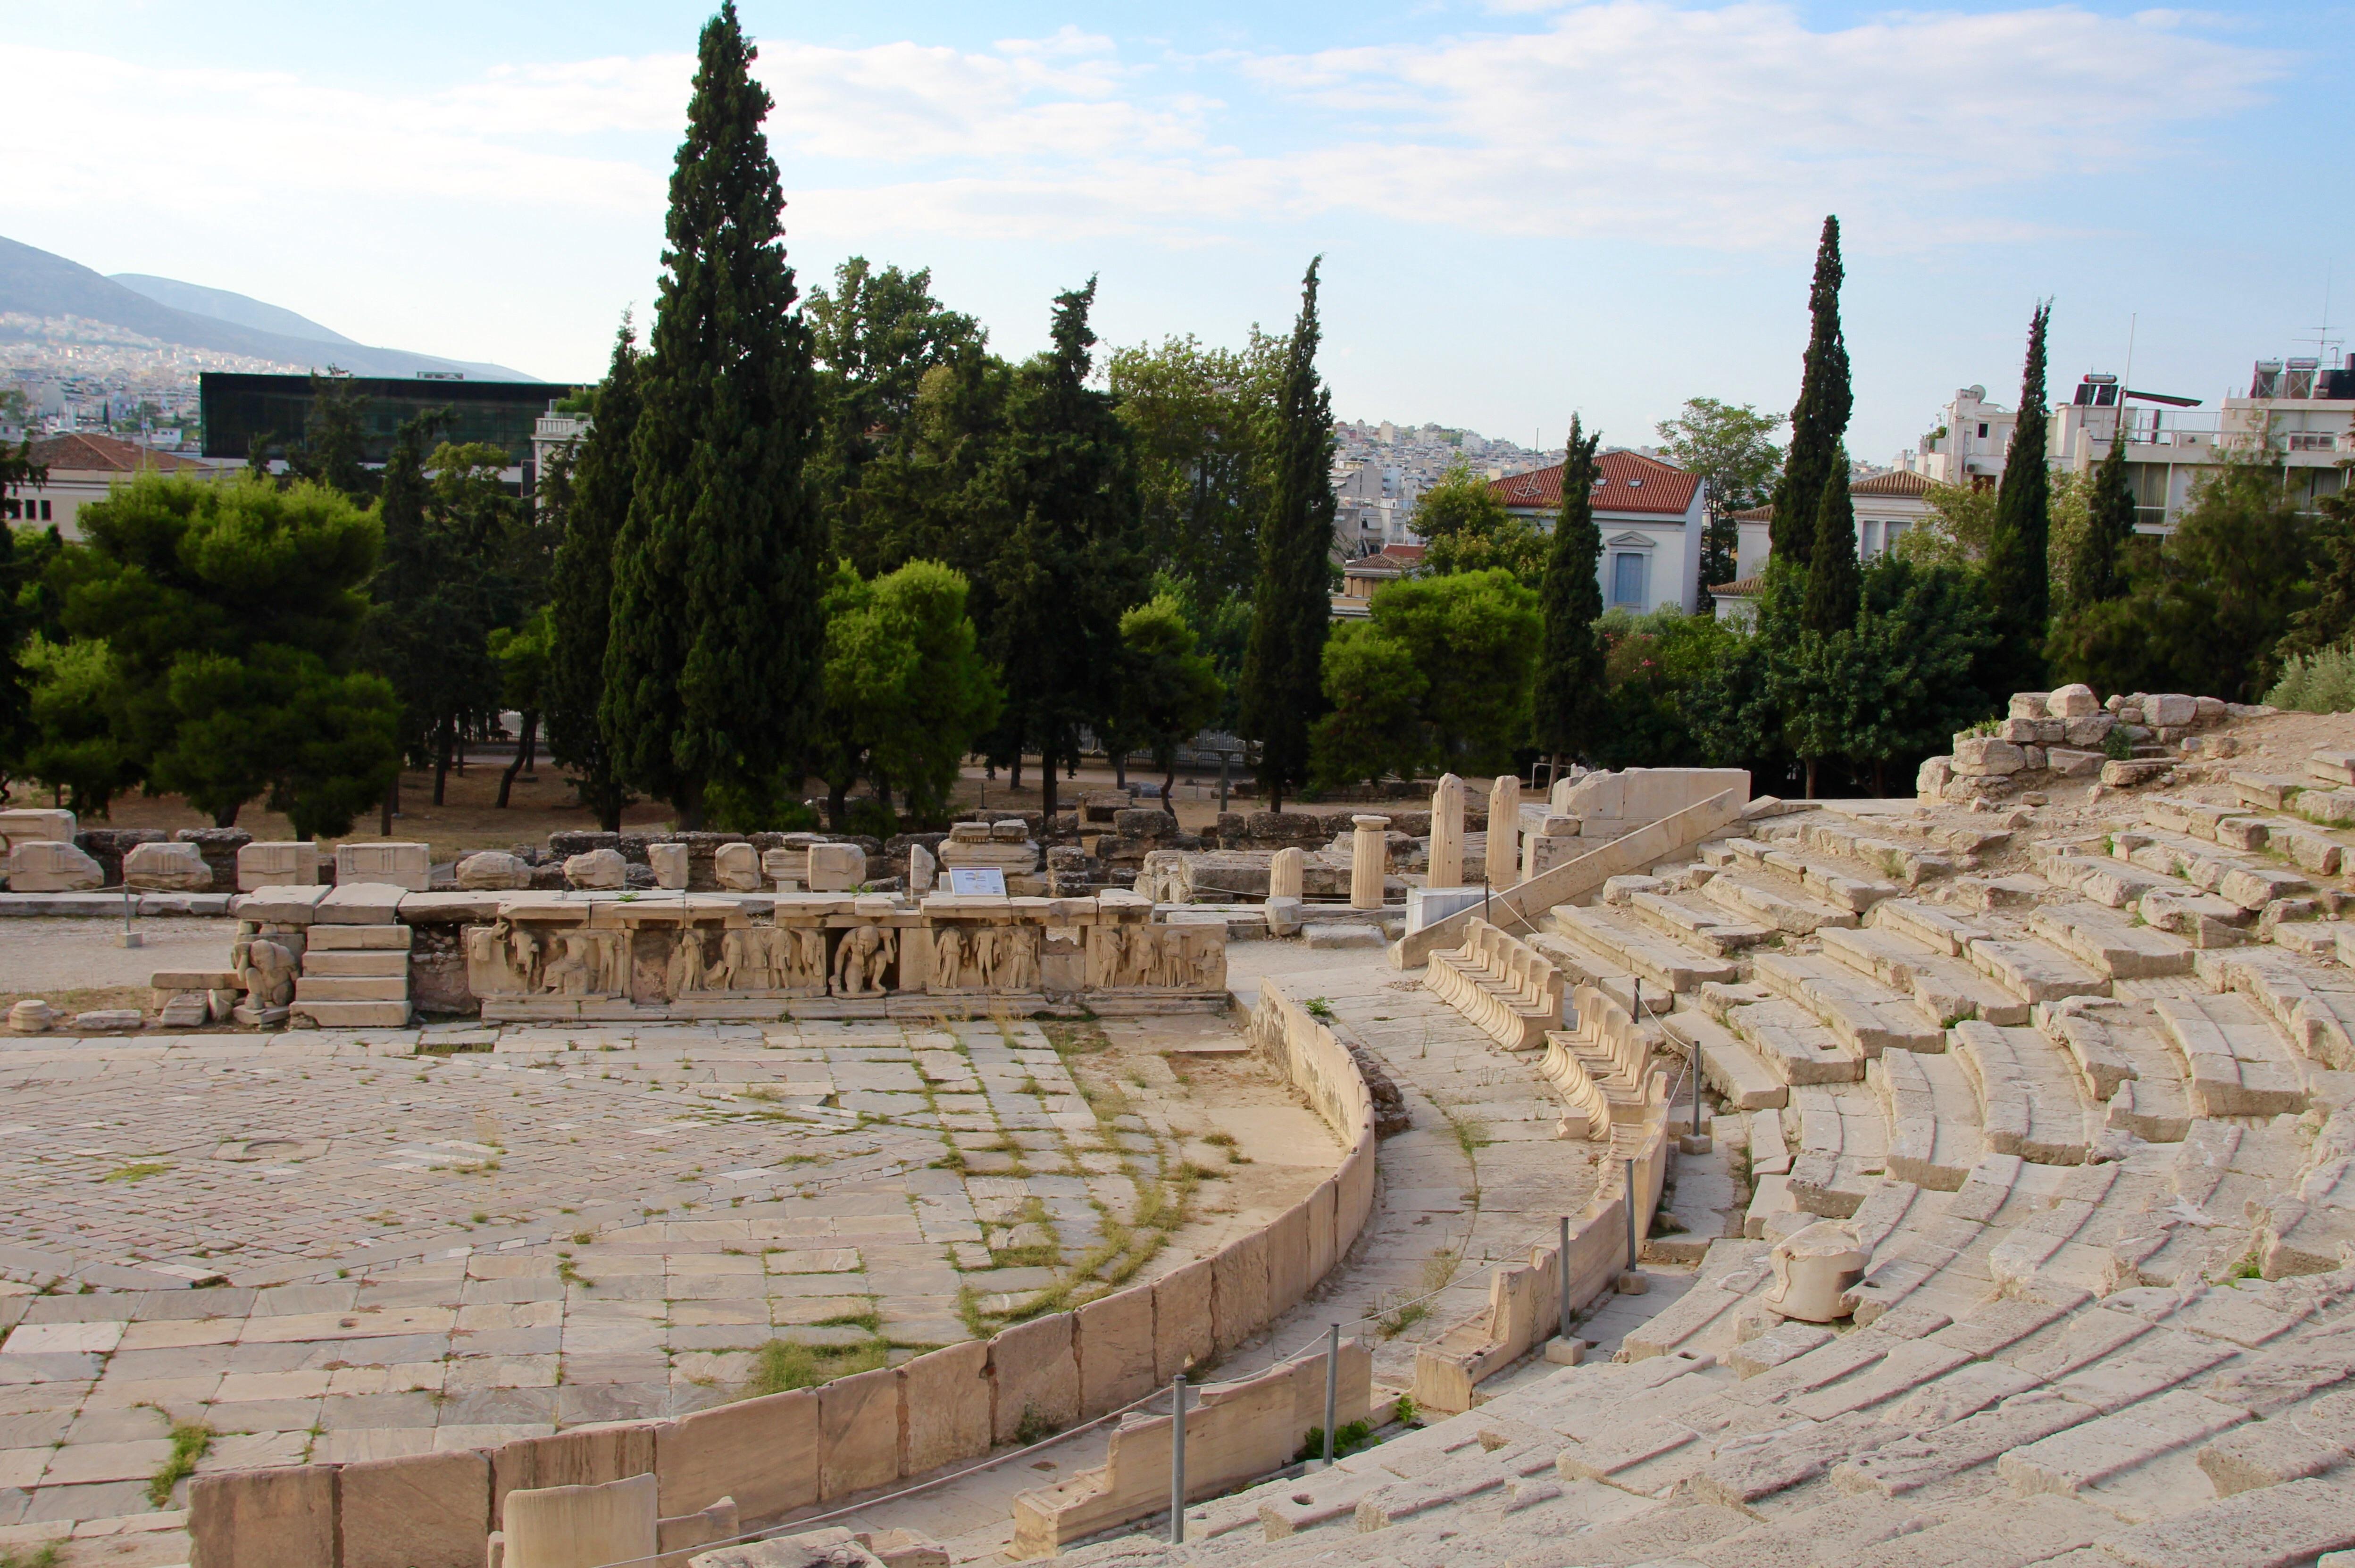 Théatre de Dionysos